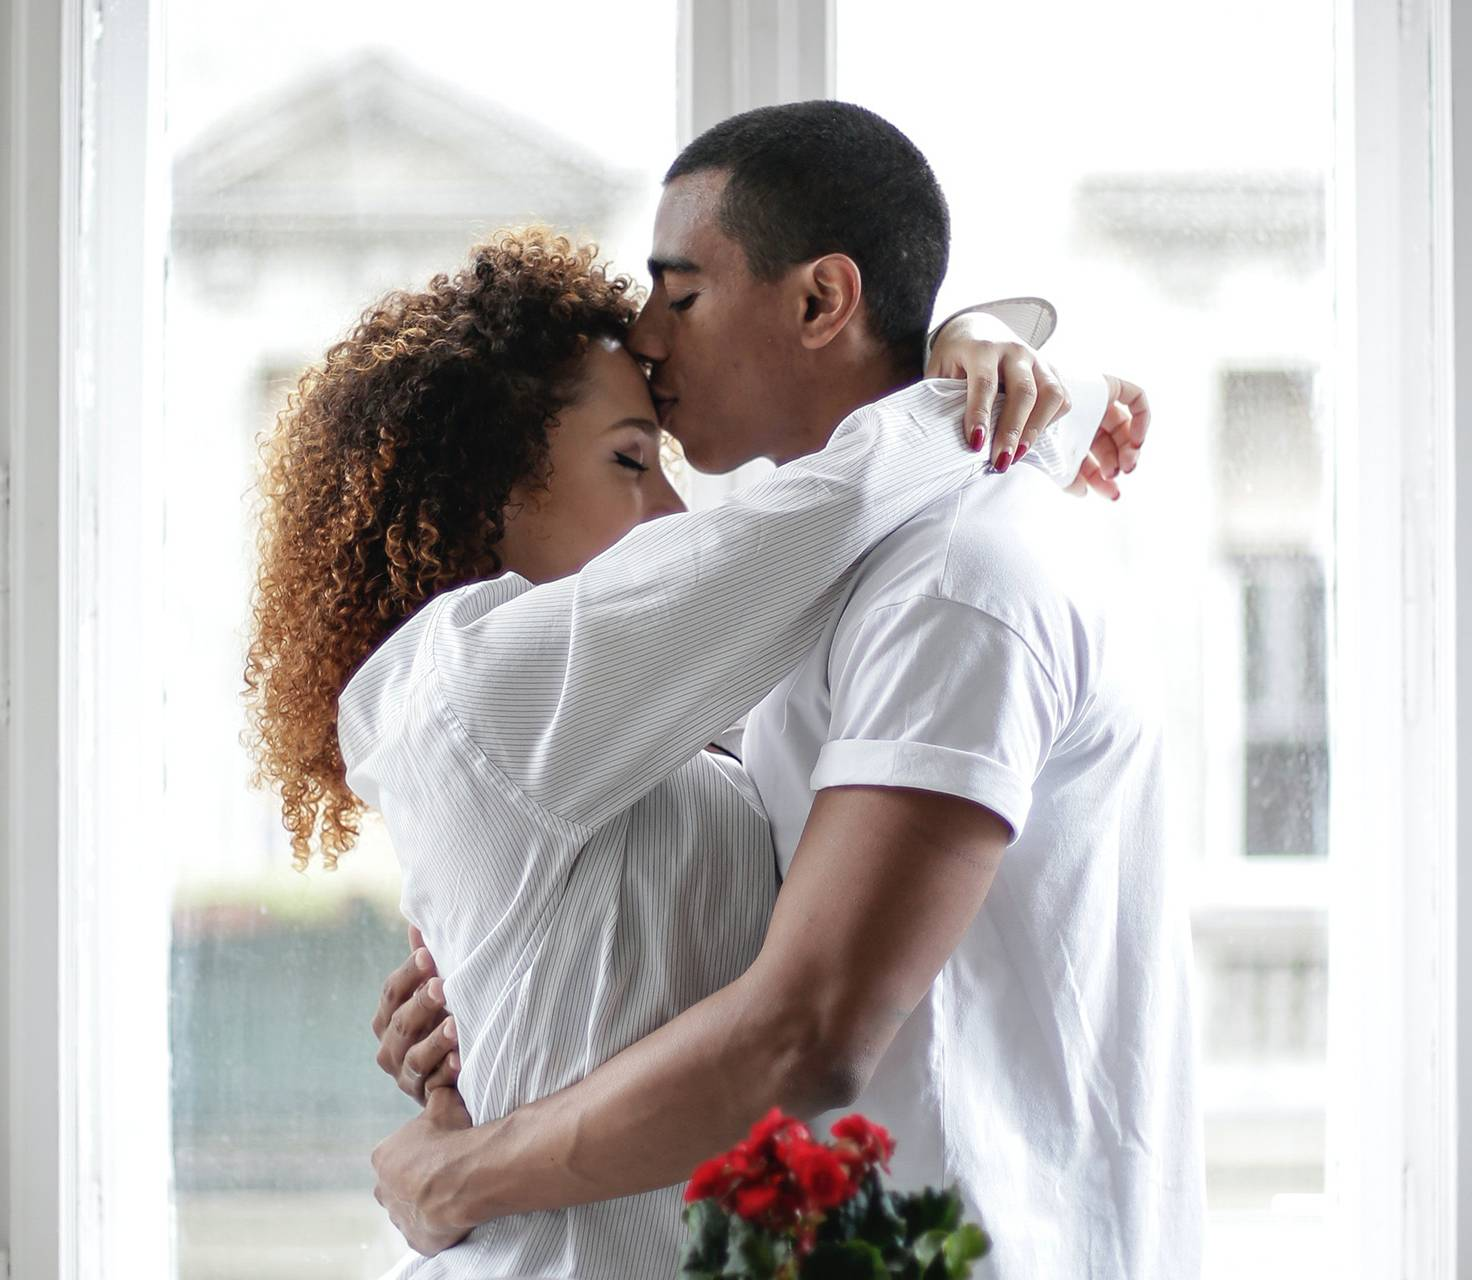 Dating Site Chat Radio Cauta i omul sa faca totul Pamant